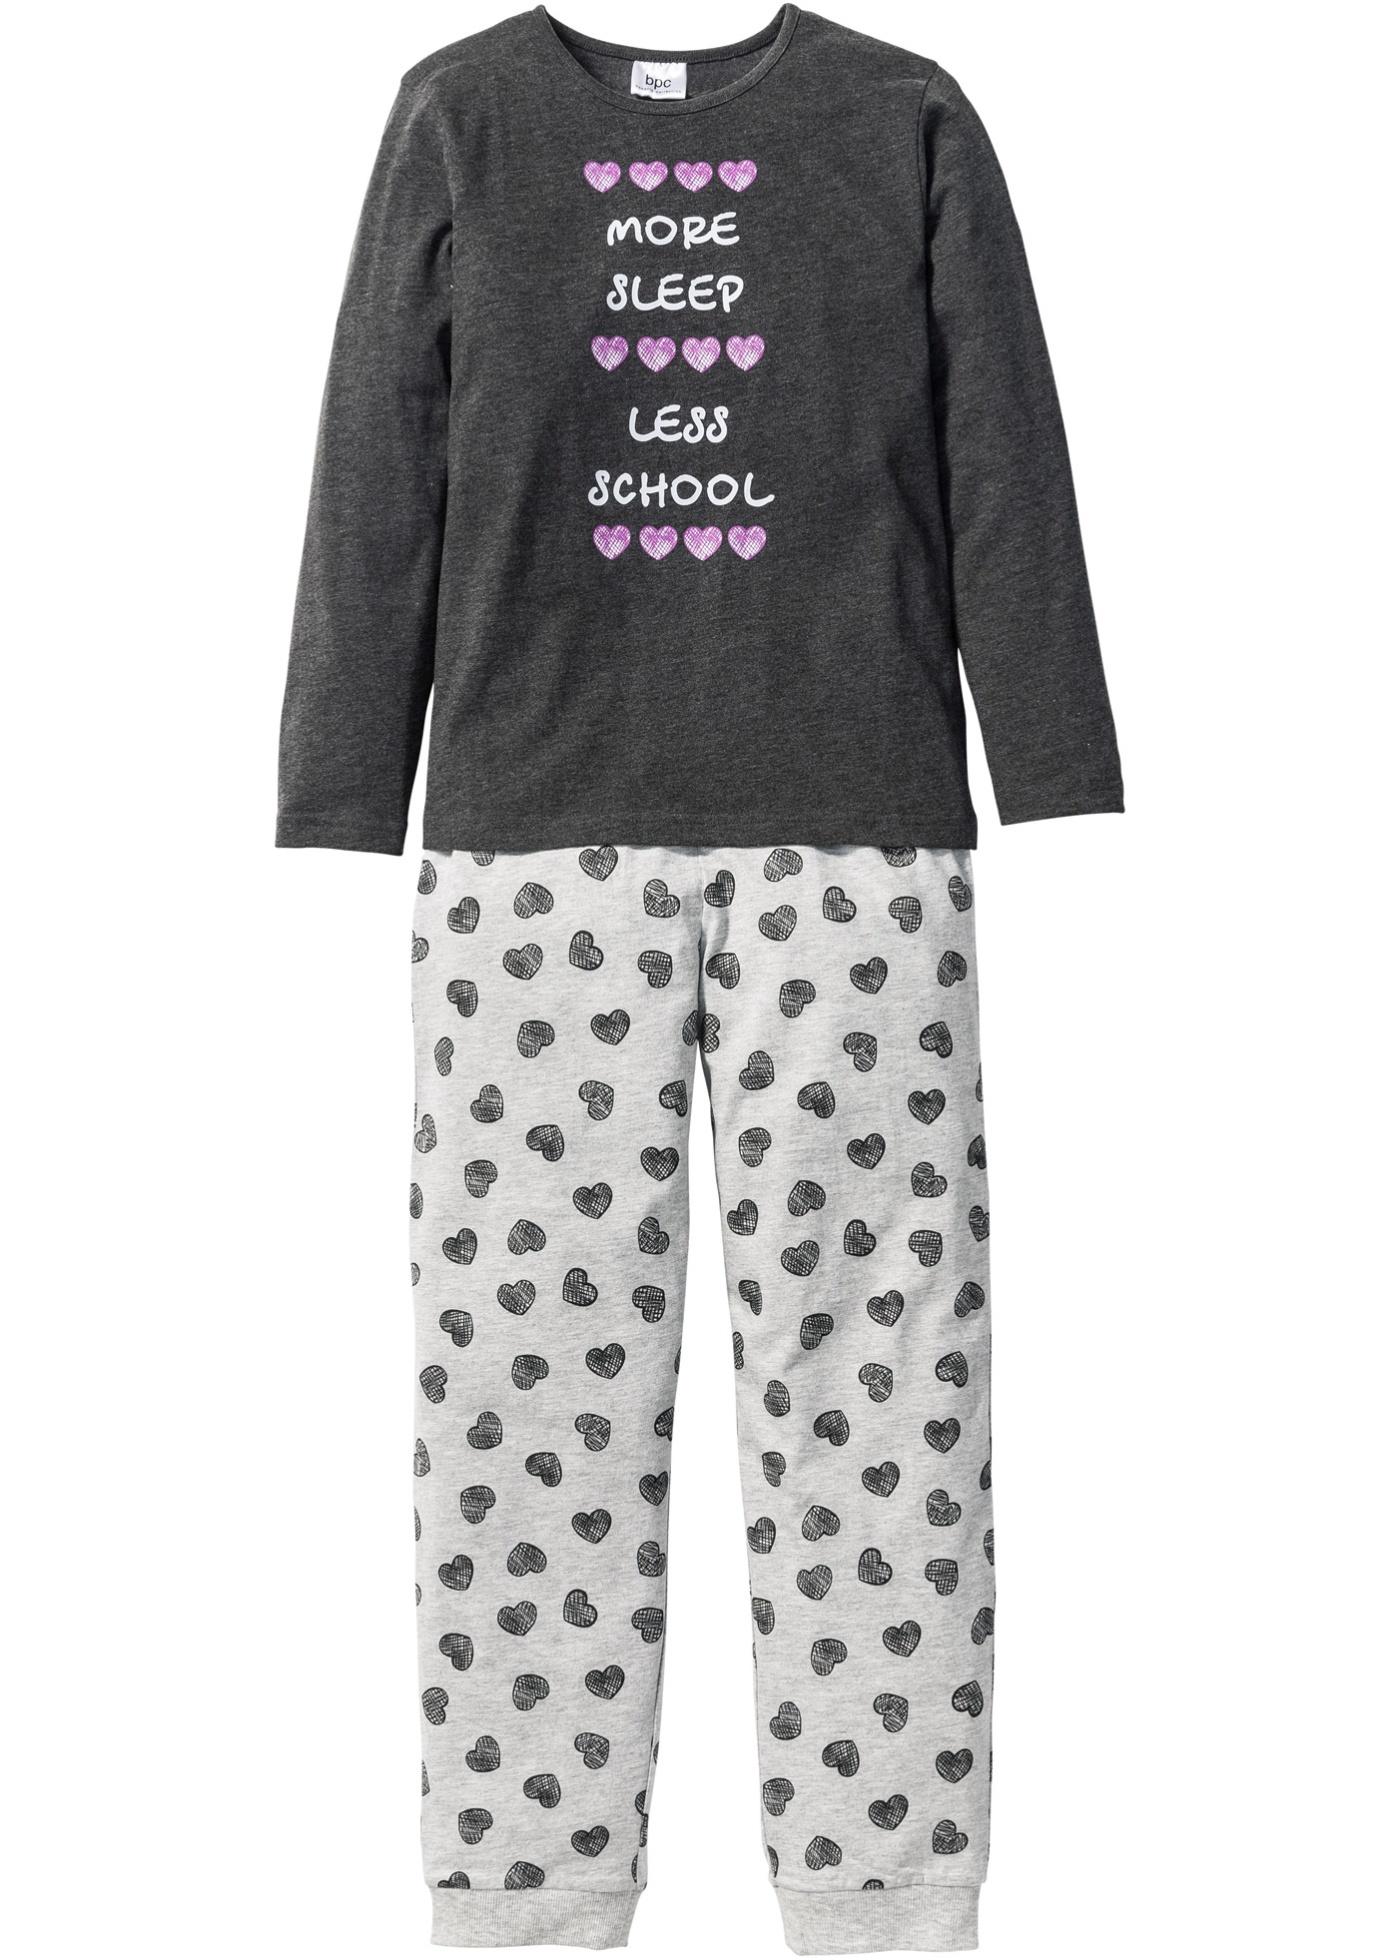 Pyjamas (2-delat set), strl. 128/134-176/182